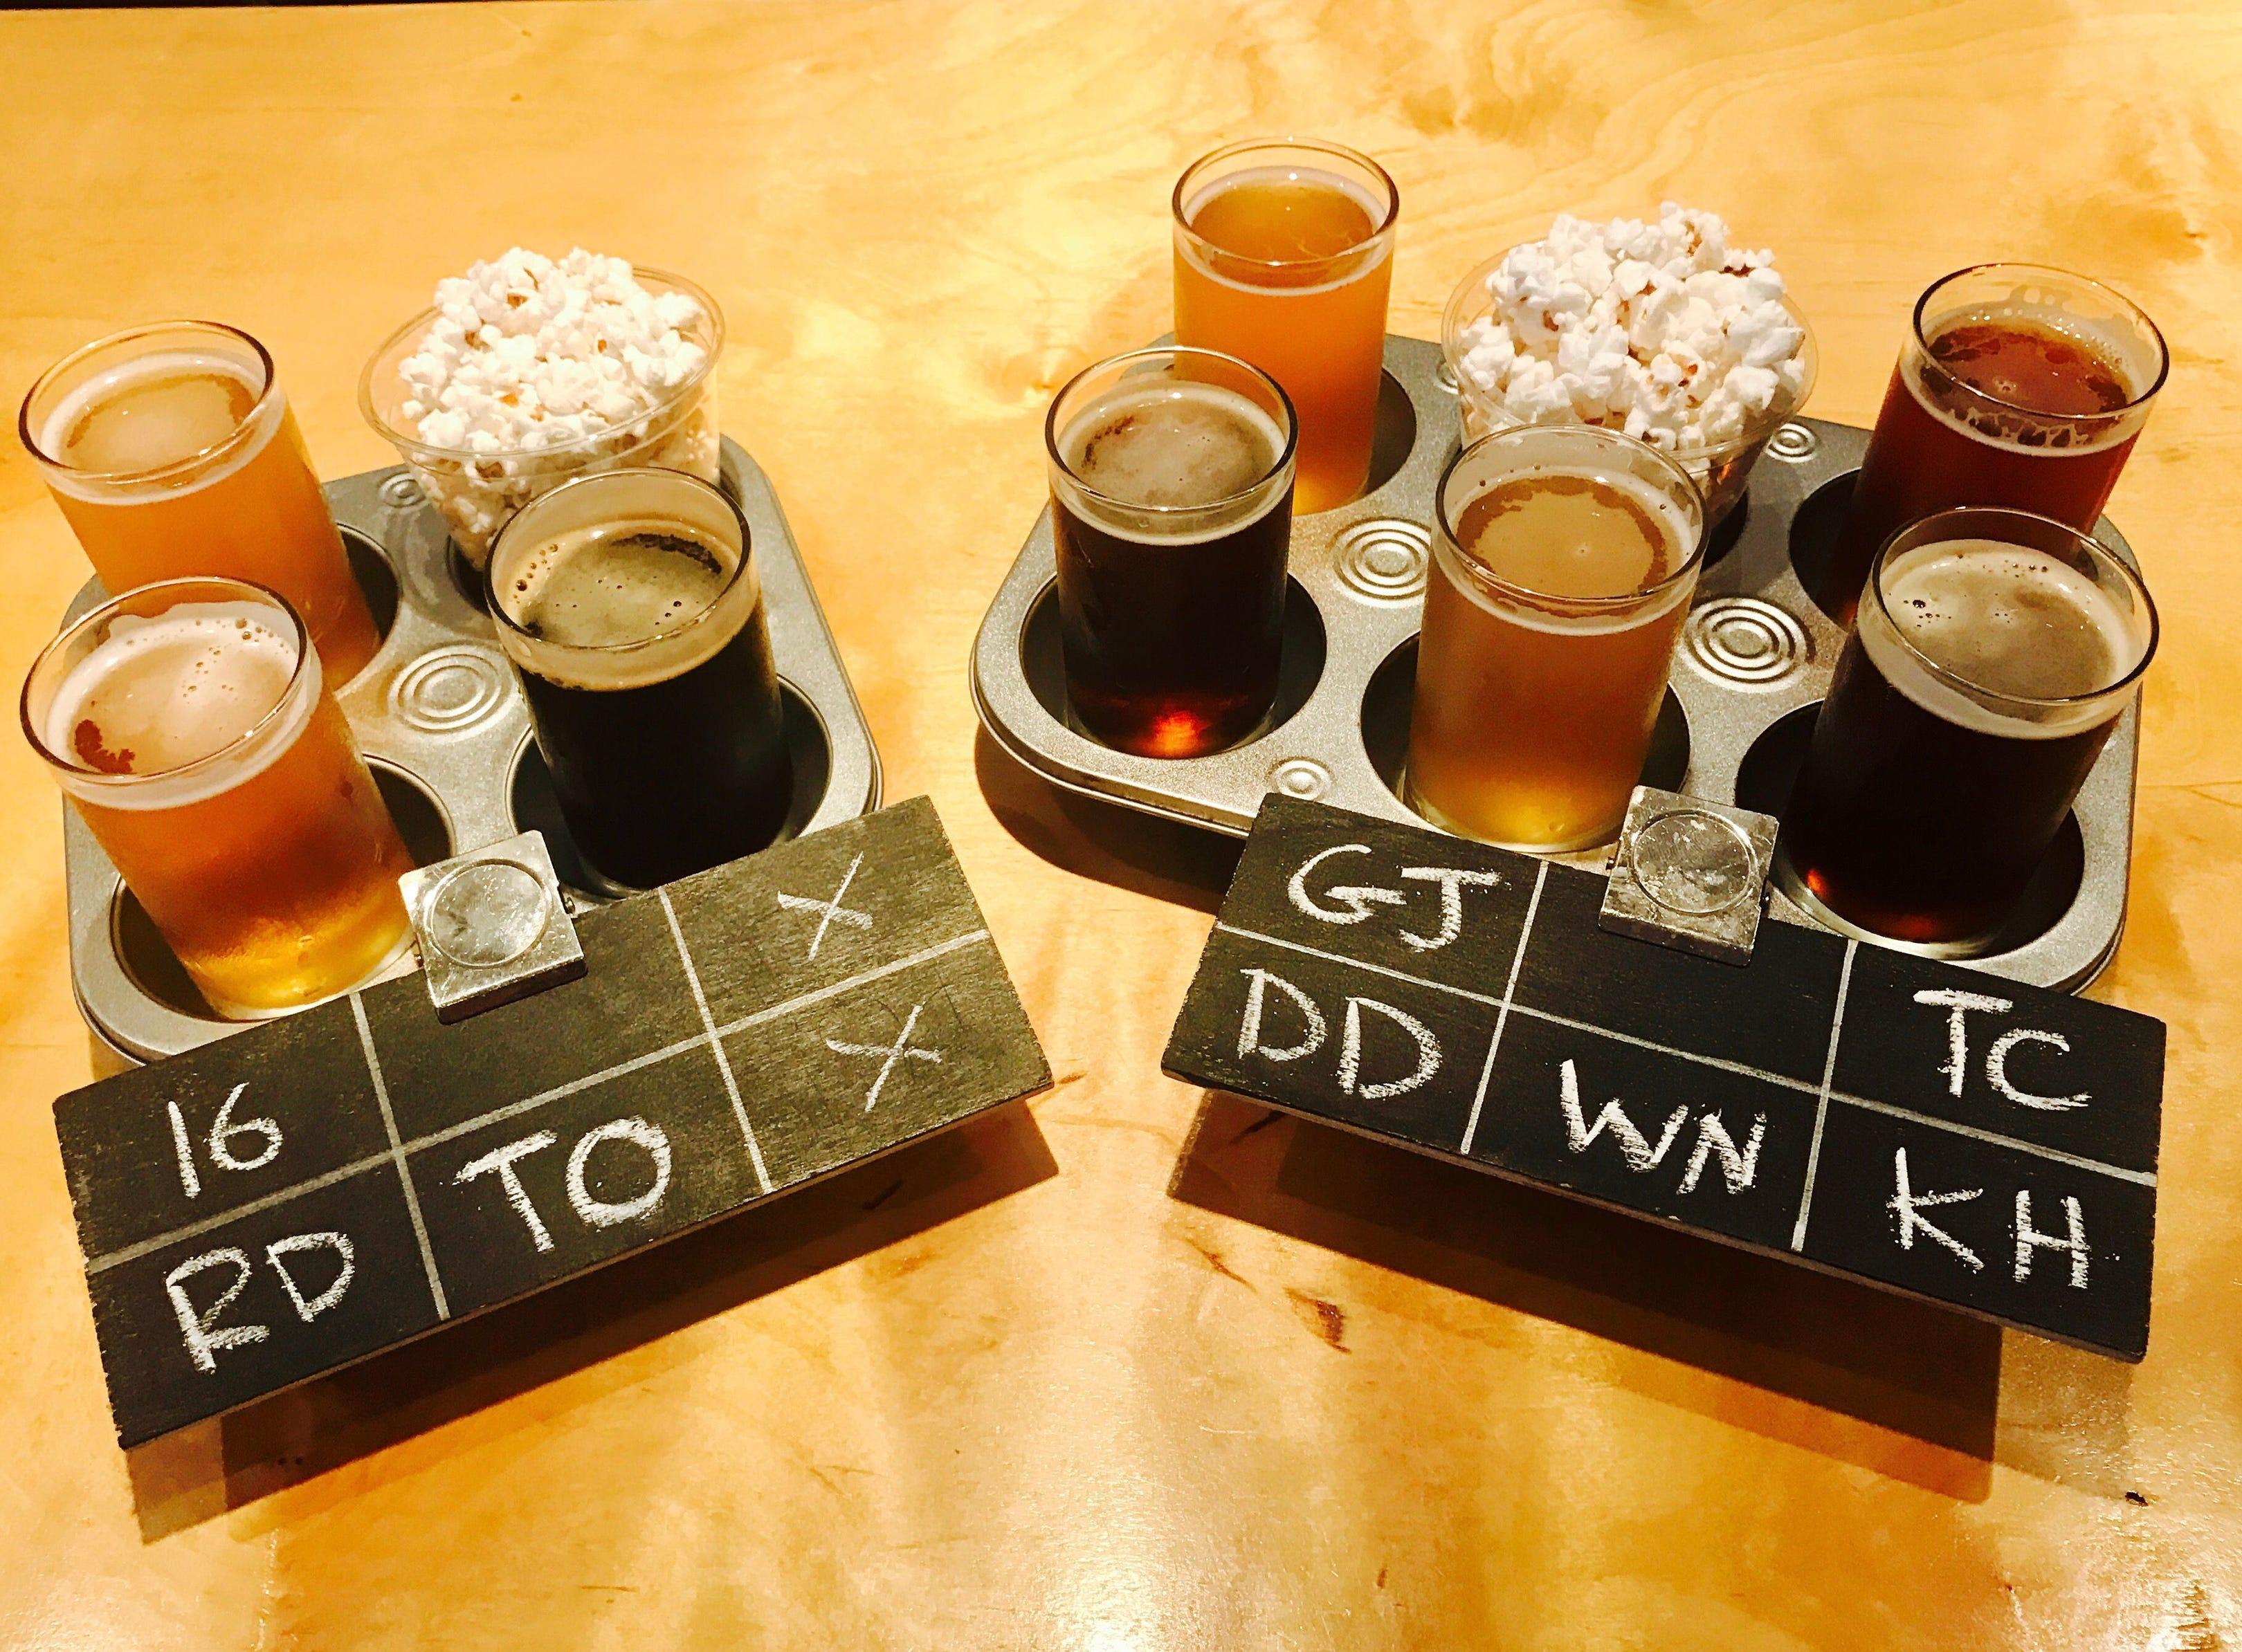 Momentum Brewhouse creates a variety of craft beers in Bonita Springs.